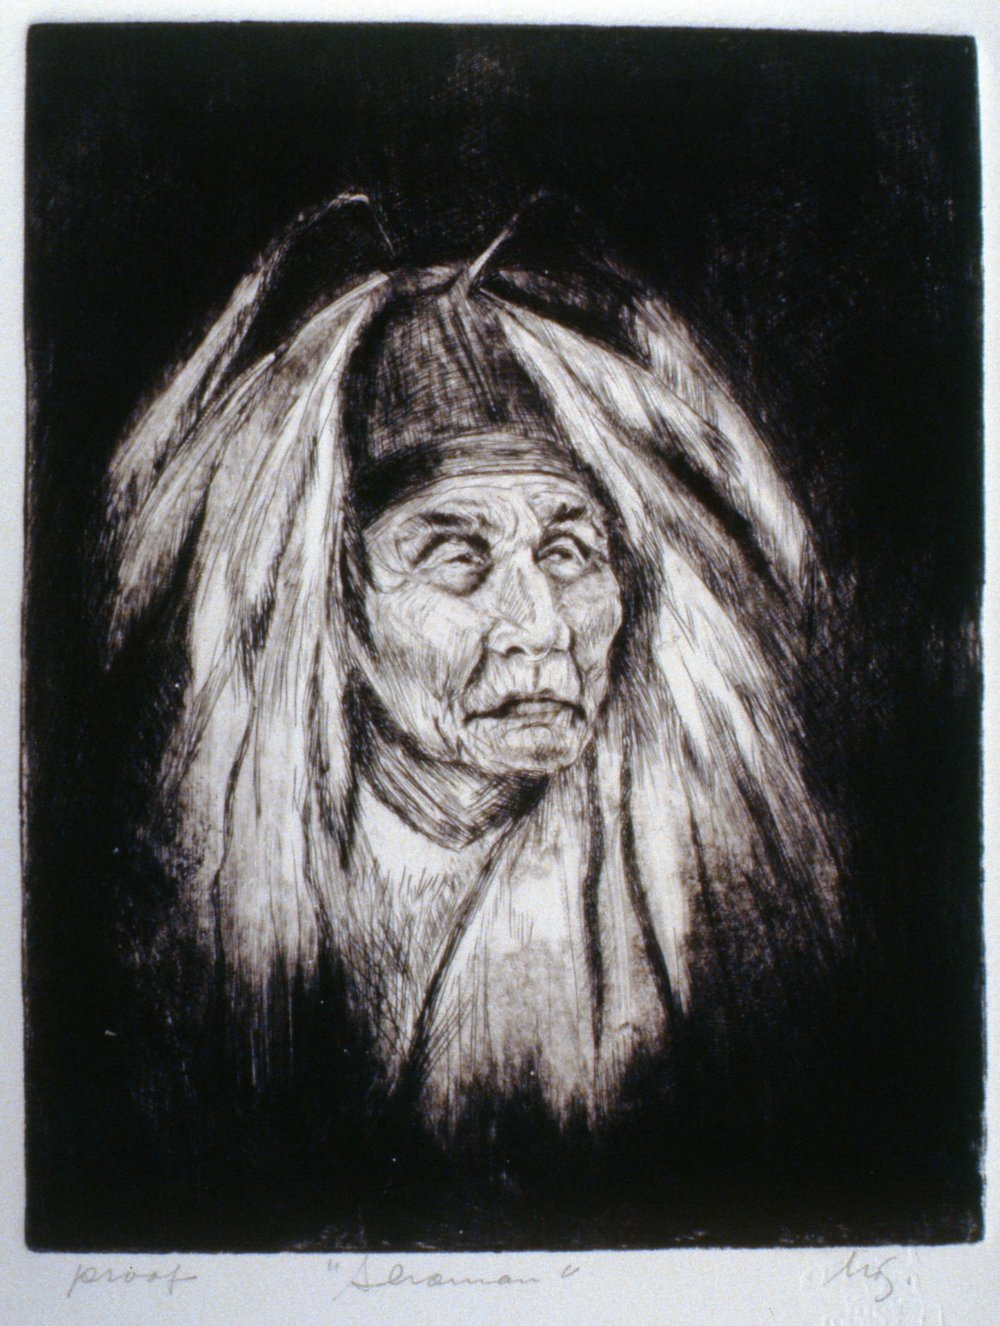 Shaman, 1980, Minn Sjløseth, artist proof, 25 x 20 cm, 1996.02.11